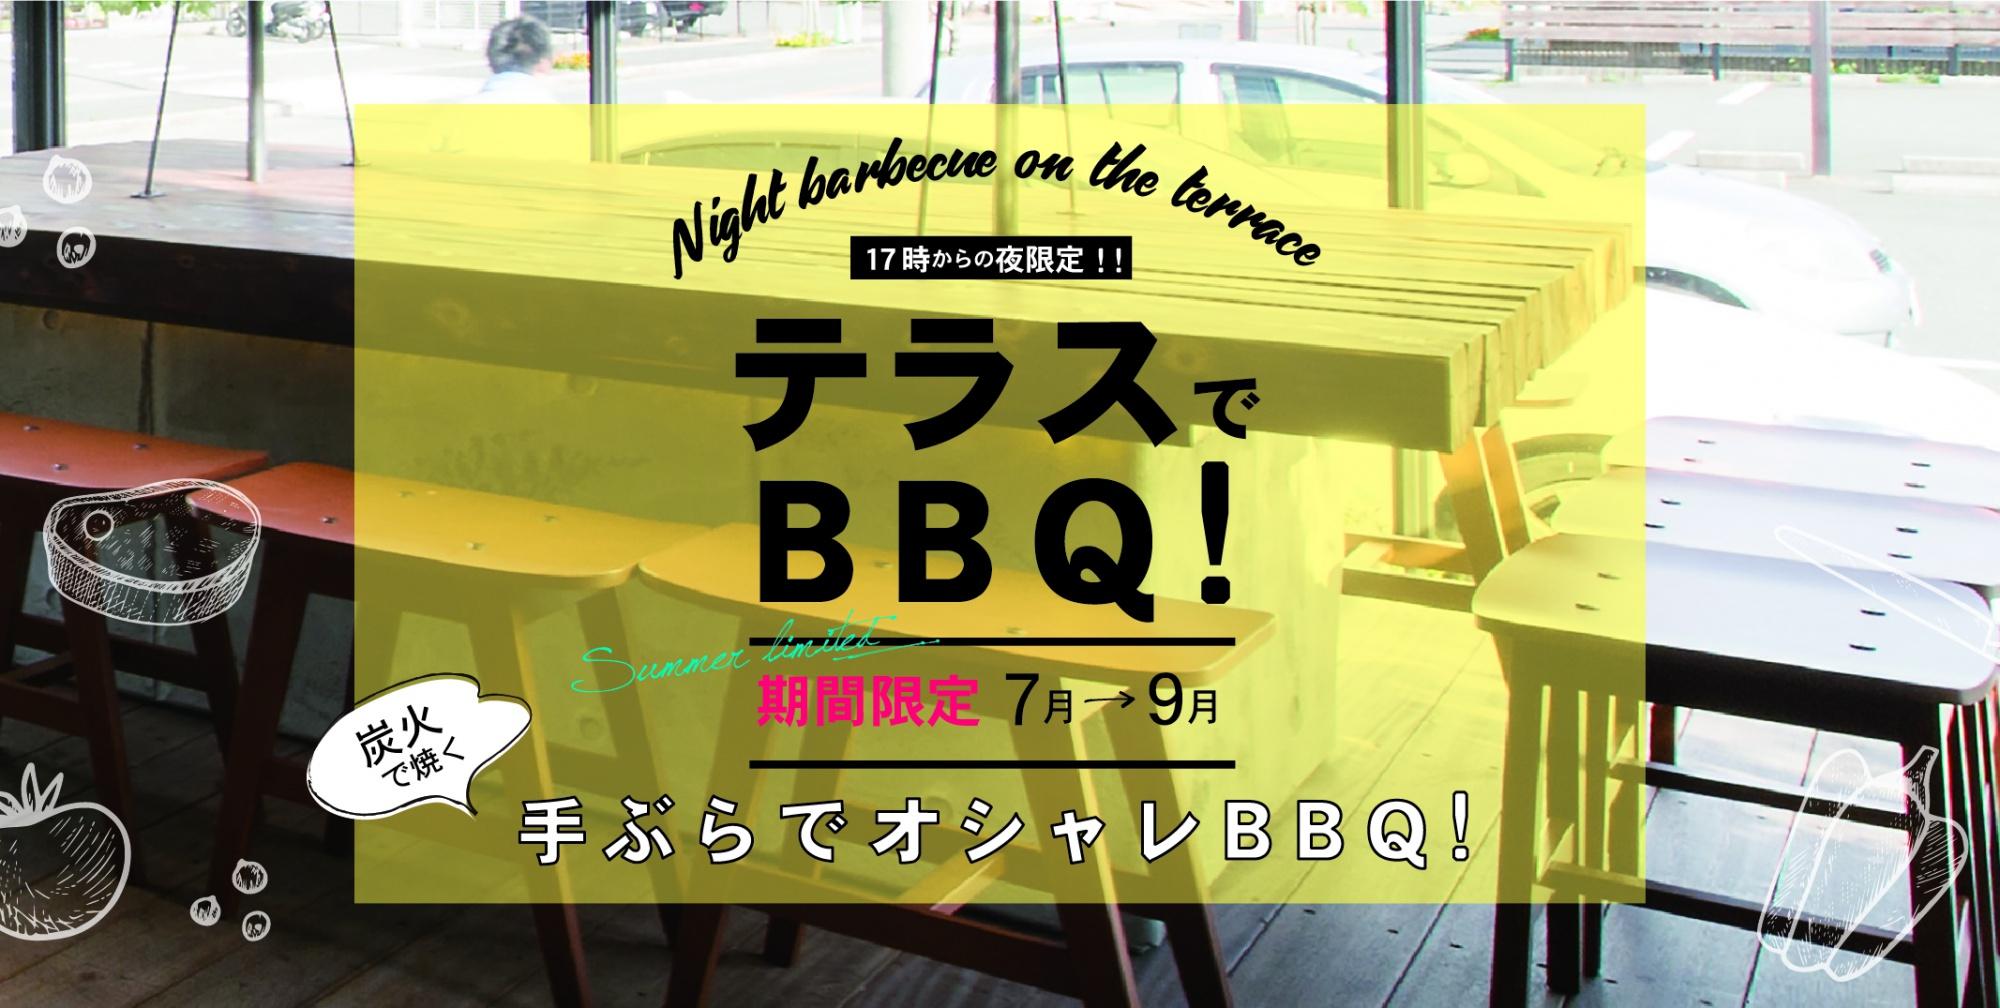 436TERRACEで夏限定ナイトBBQ!